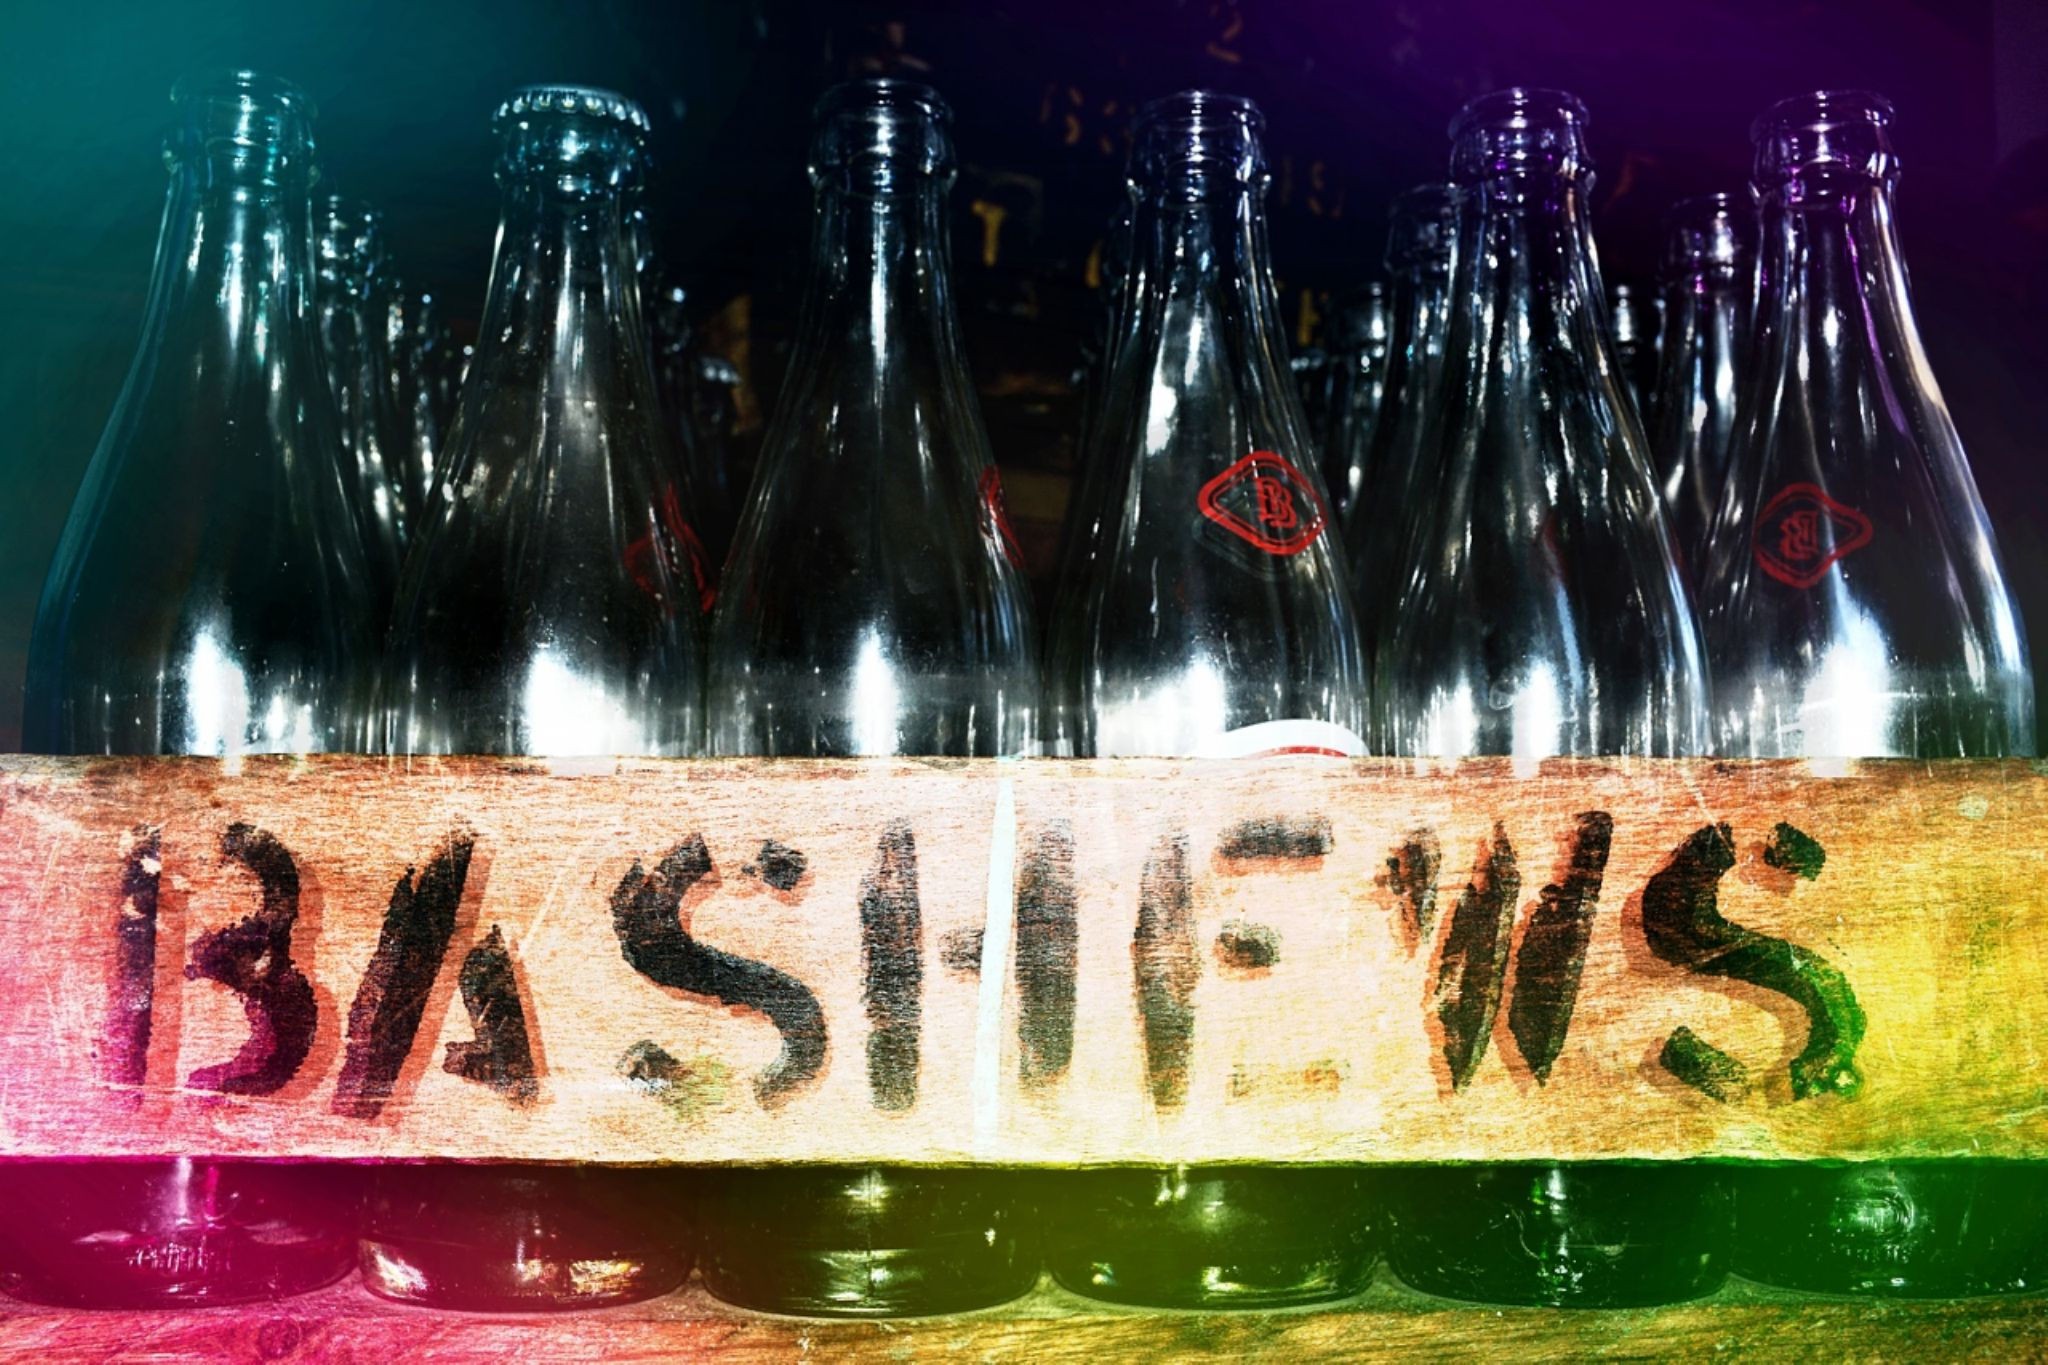 Bashews by cornelbouwer